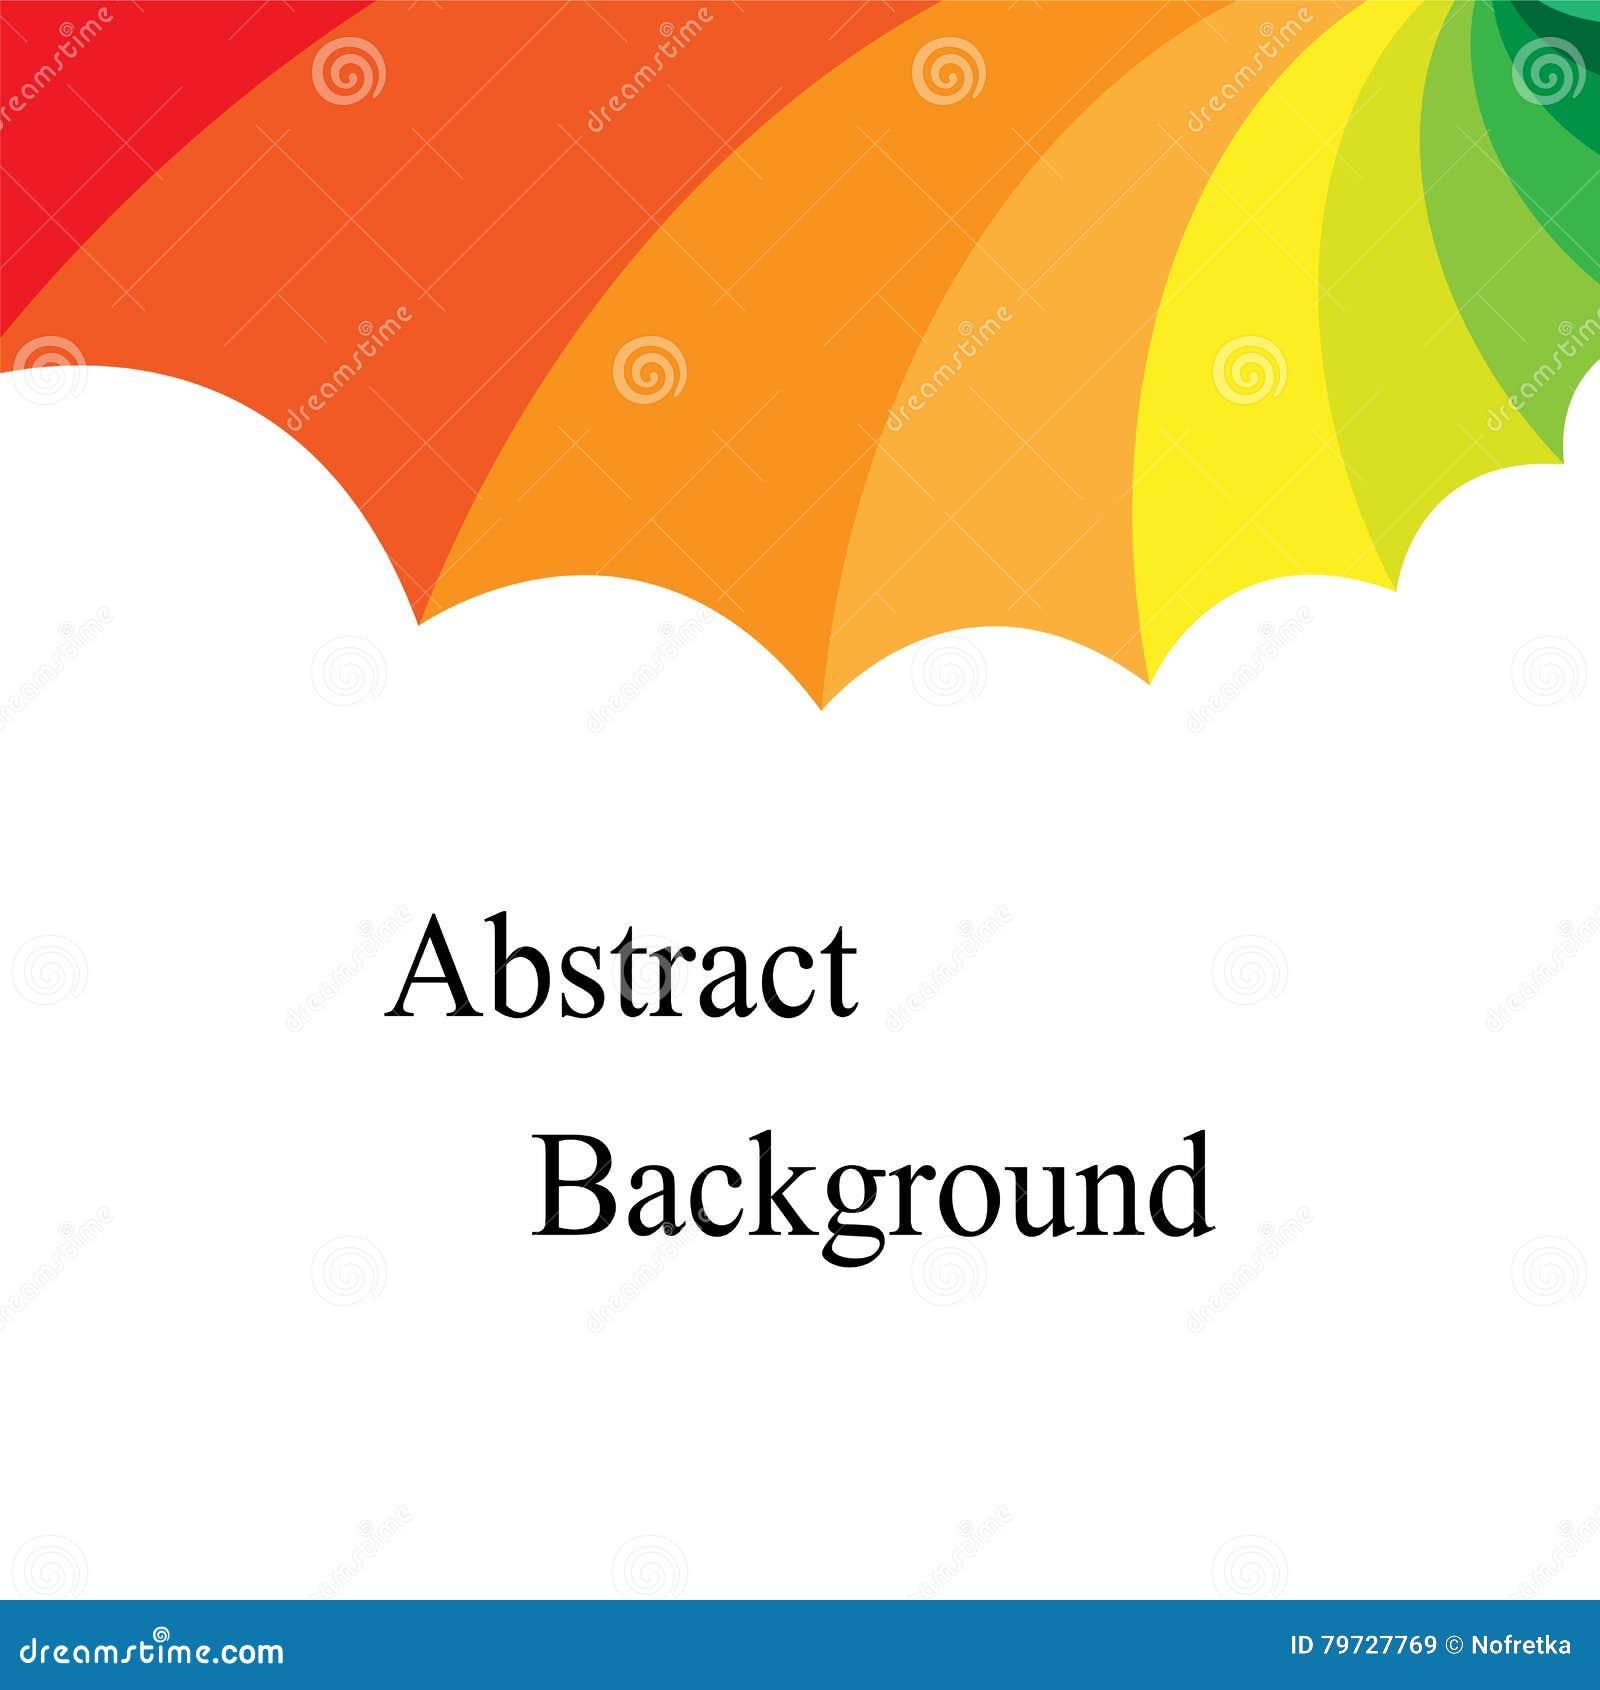 Rayas disminuidas cóncavas coloreadas arco iris Plantilla para las etiquetas, aviadores, banderas, insignias, carteles, etiquetas